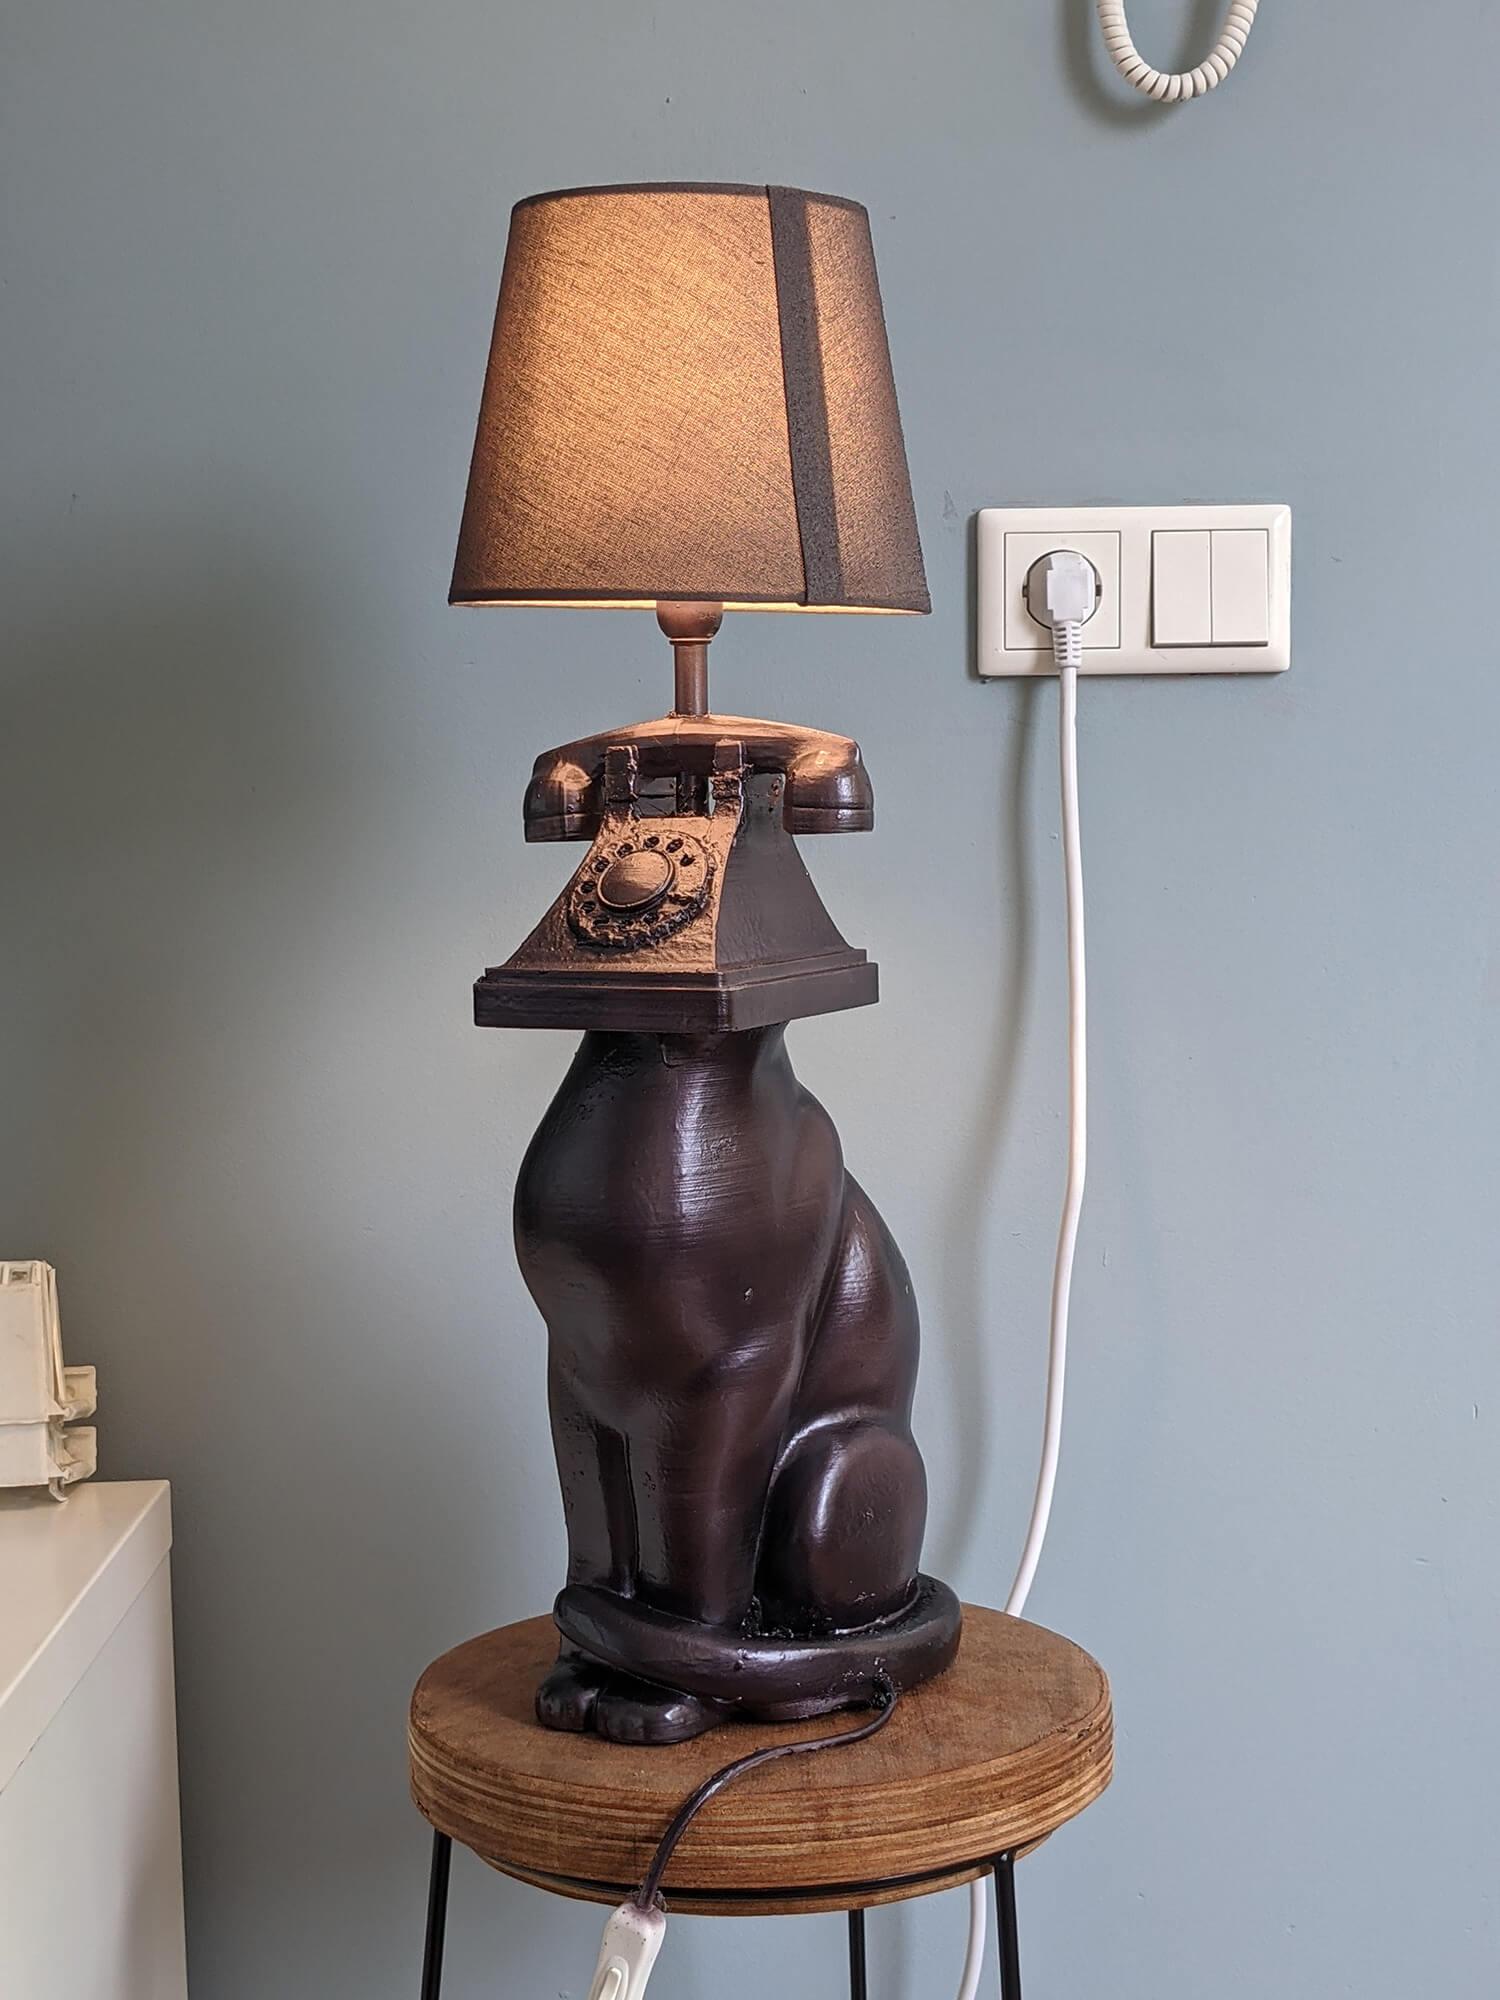 I like lamps